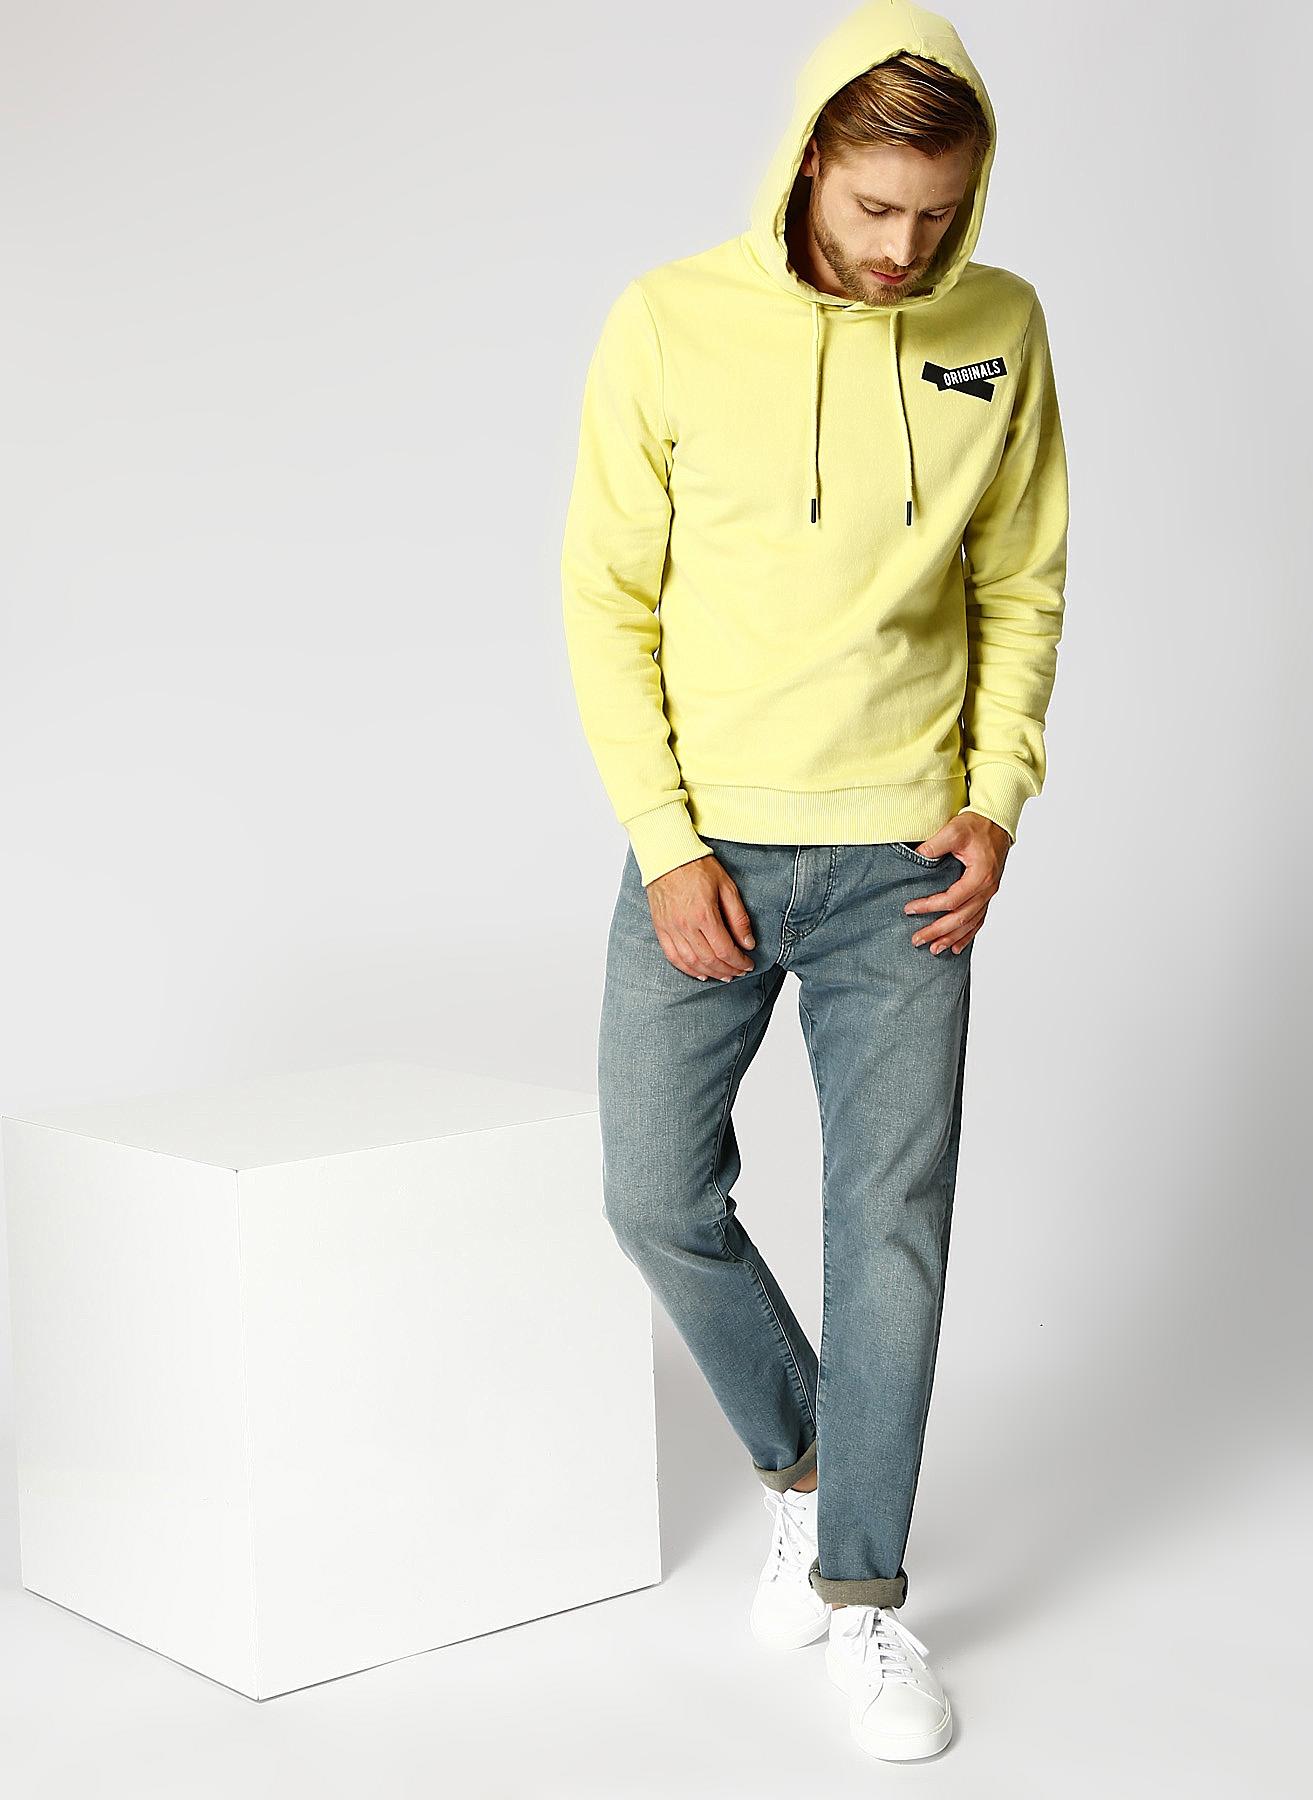 Mavi Jake Foogy Mavi Klasik Pantolon 31-30 5001822786033 Ürün Resmi